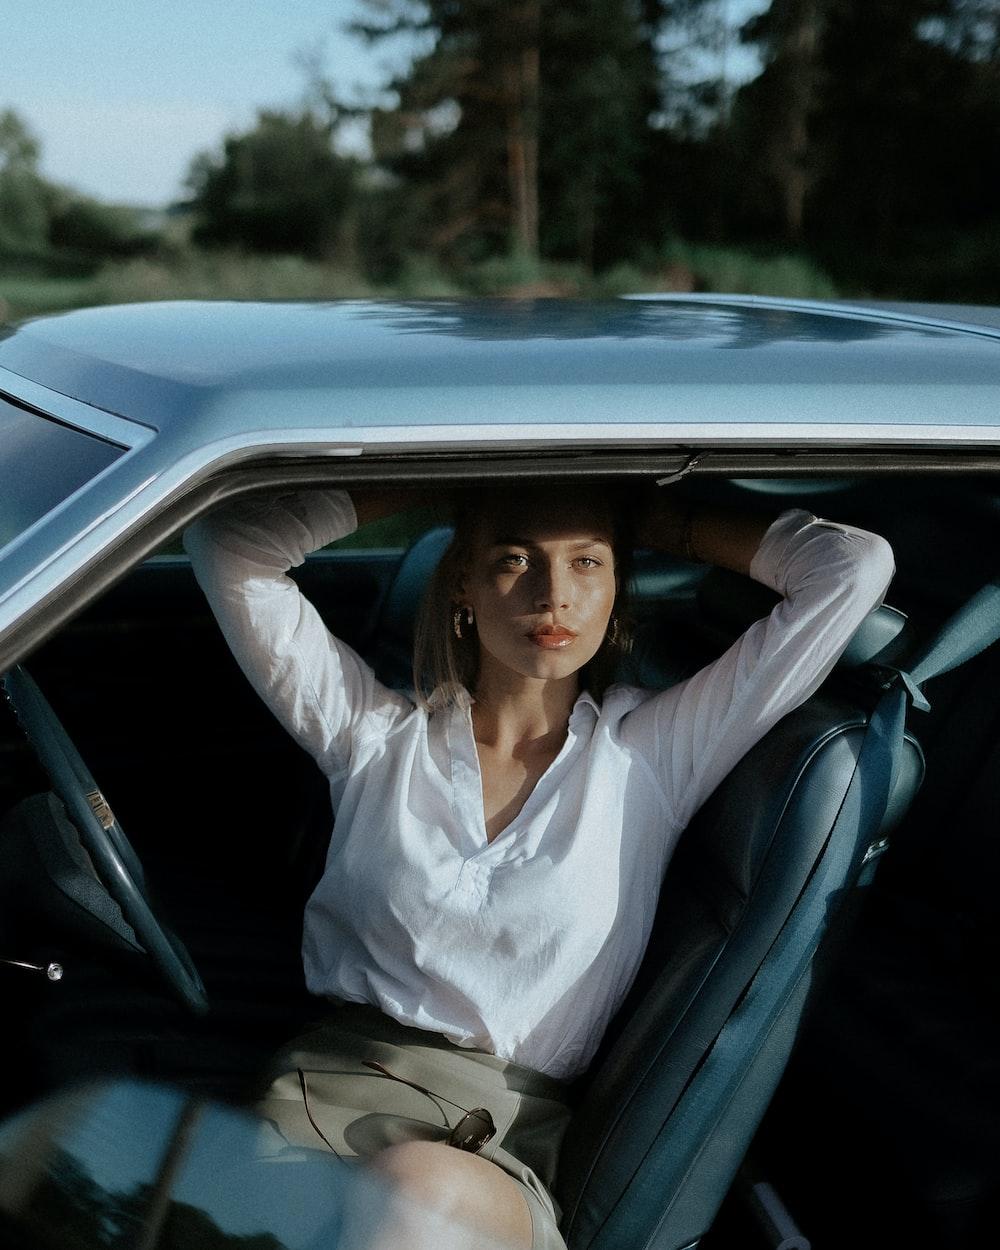 woman in white dress shirt sitting on car seat